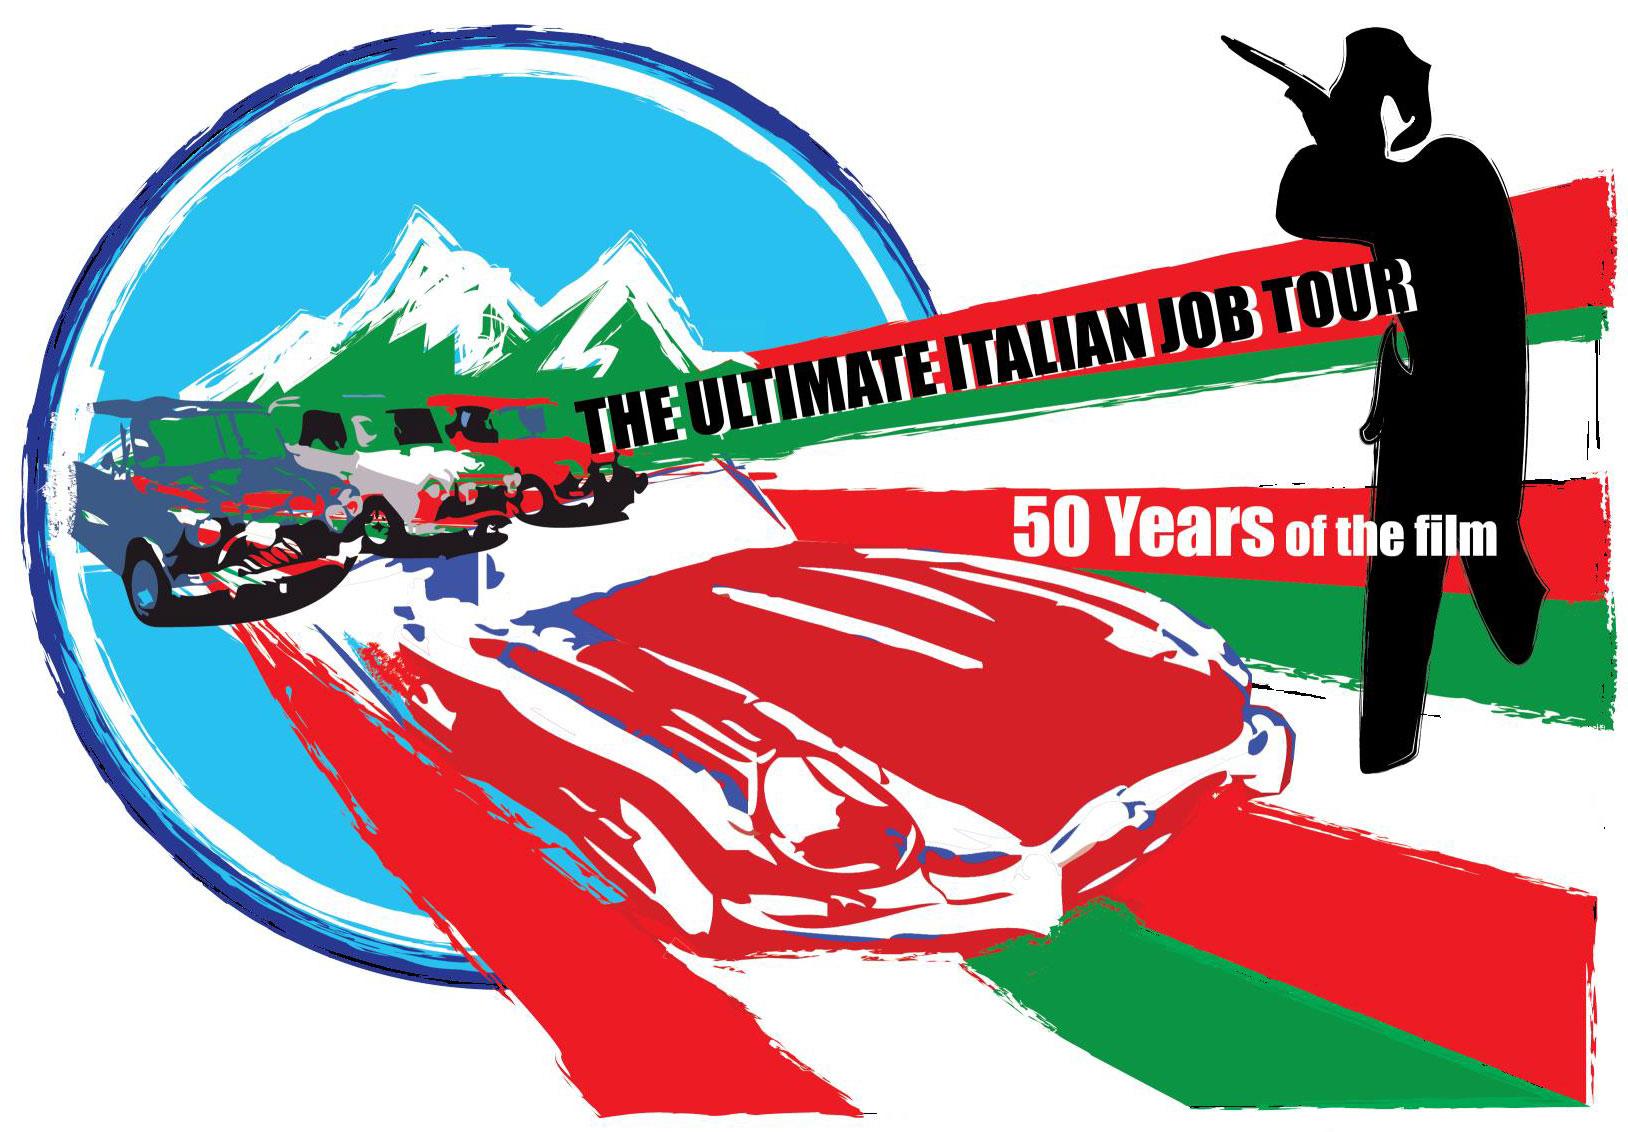 The Ultimate Italian Job Tour